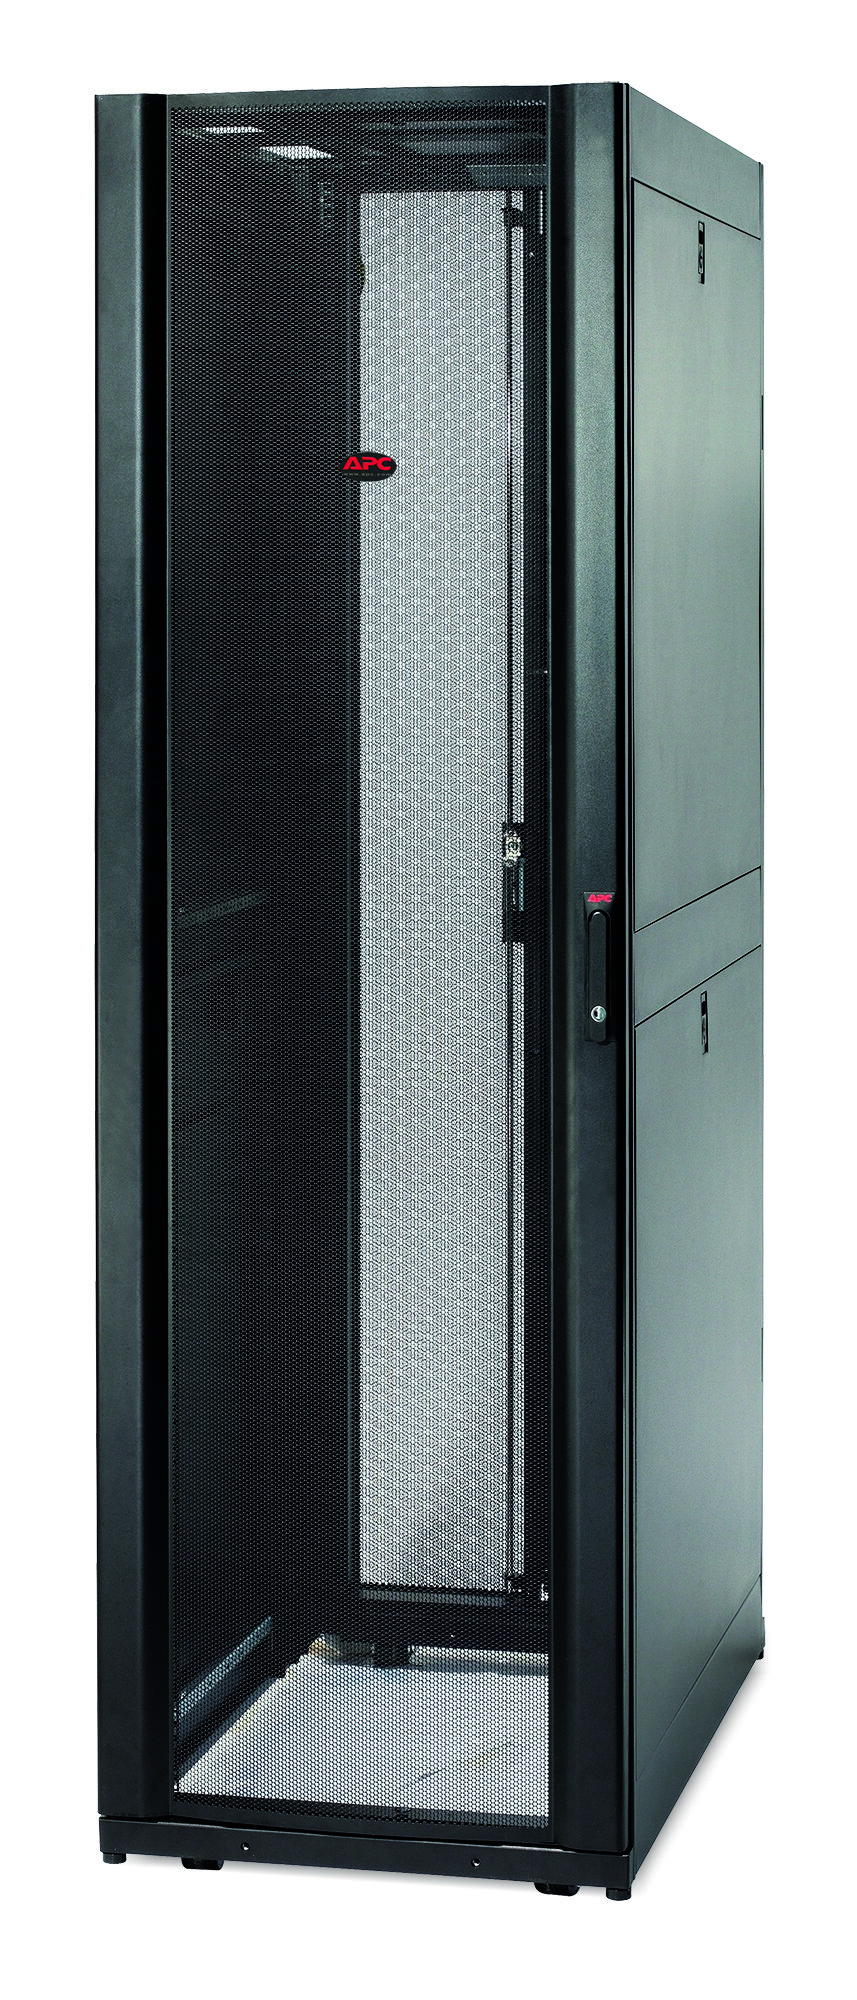 Cabinet Rack Server, APC Netshelter SX , AR 3300, 42U , 1991 mm x 600 mm x 1200 mm, Refurbished - imaginea 1